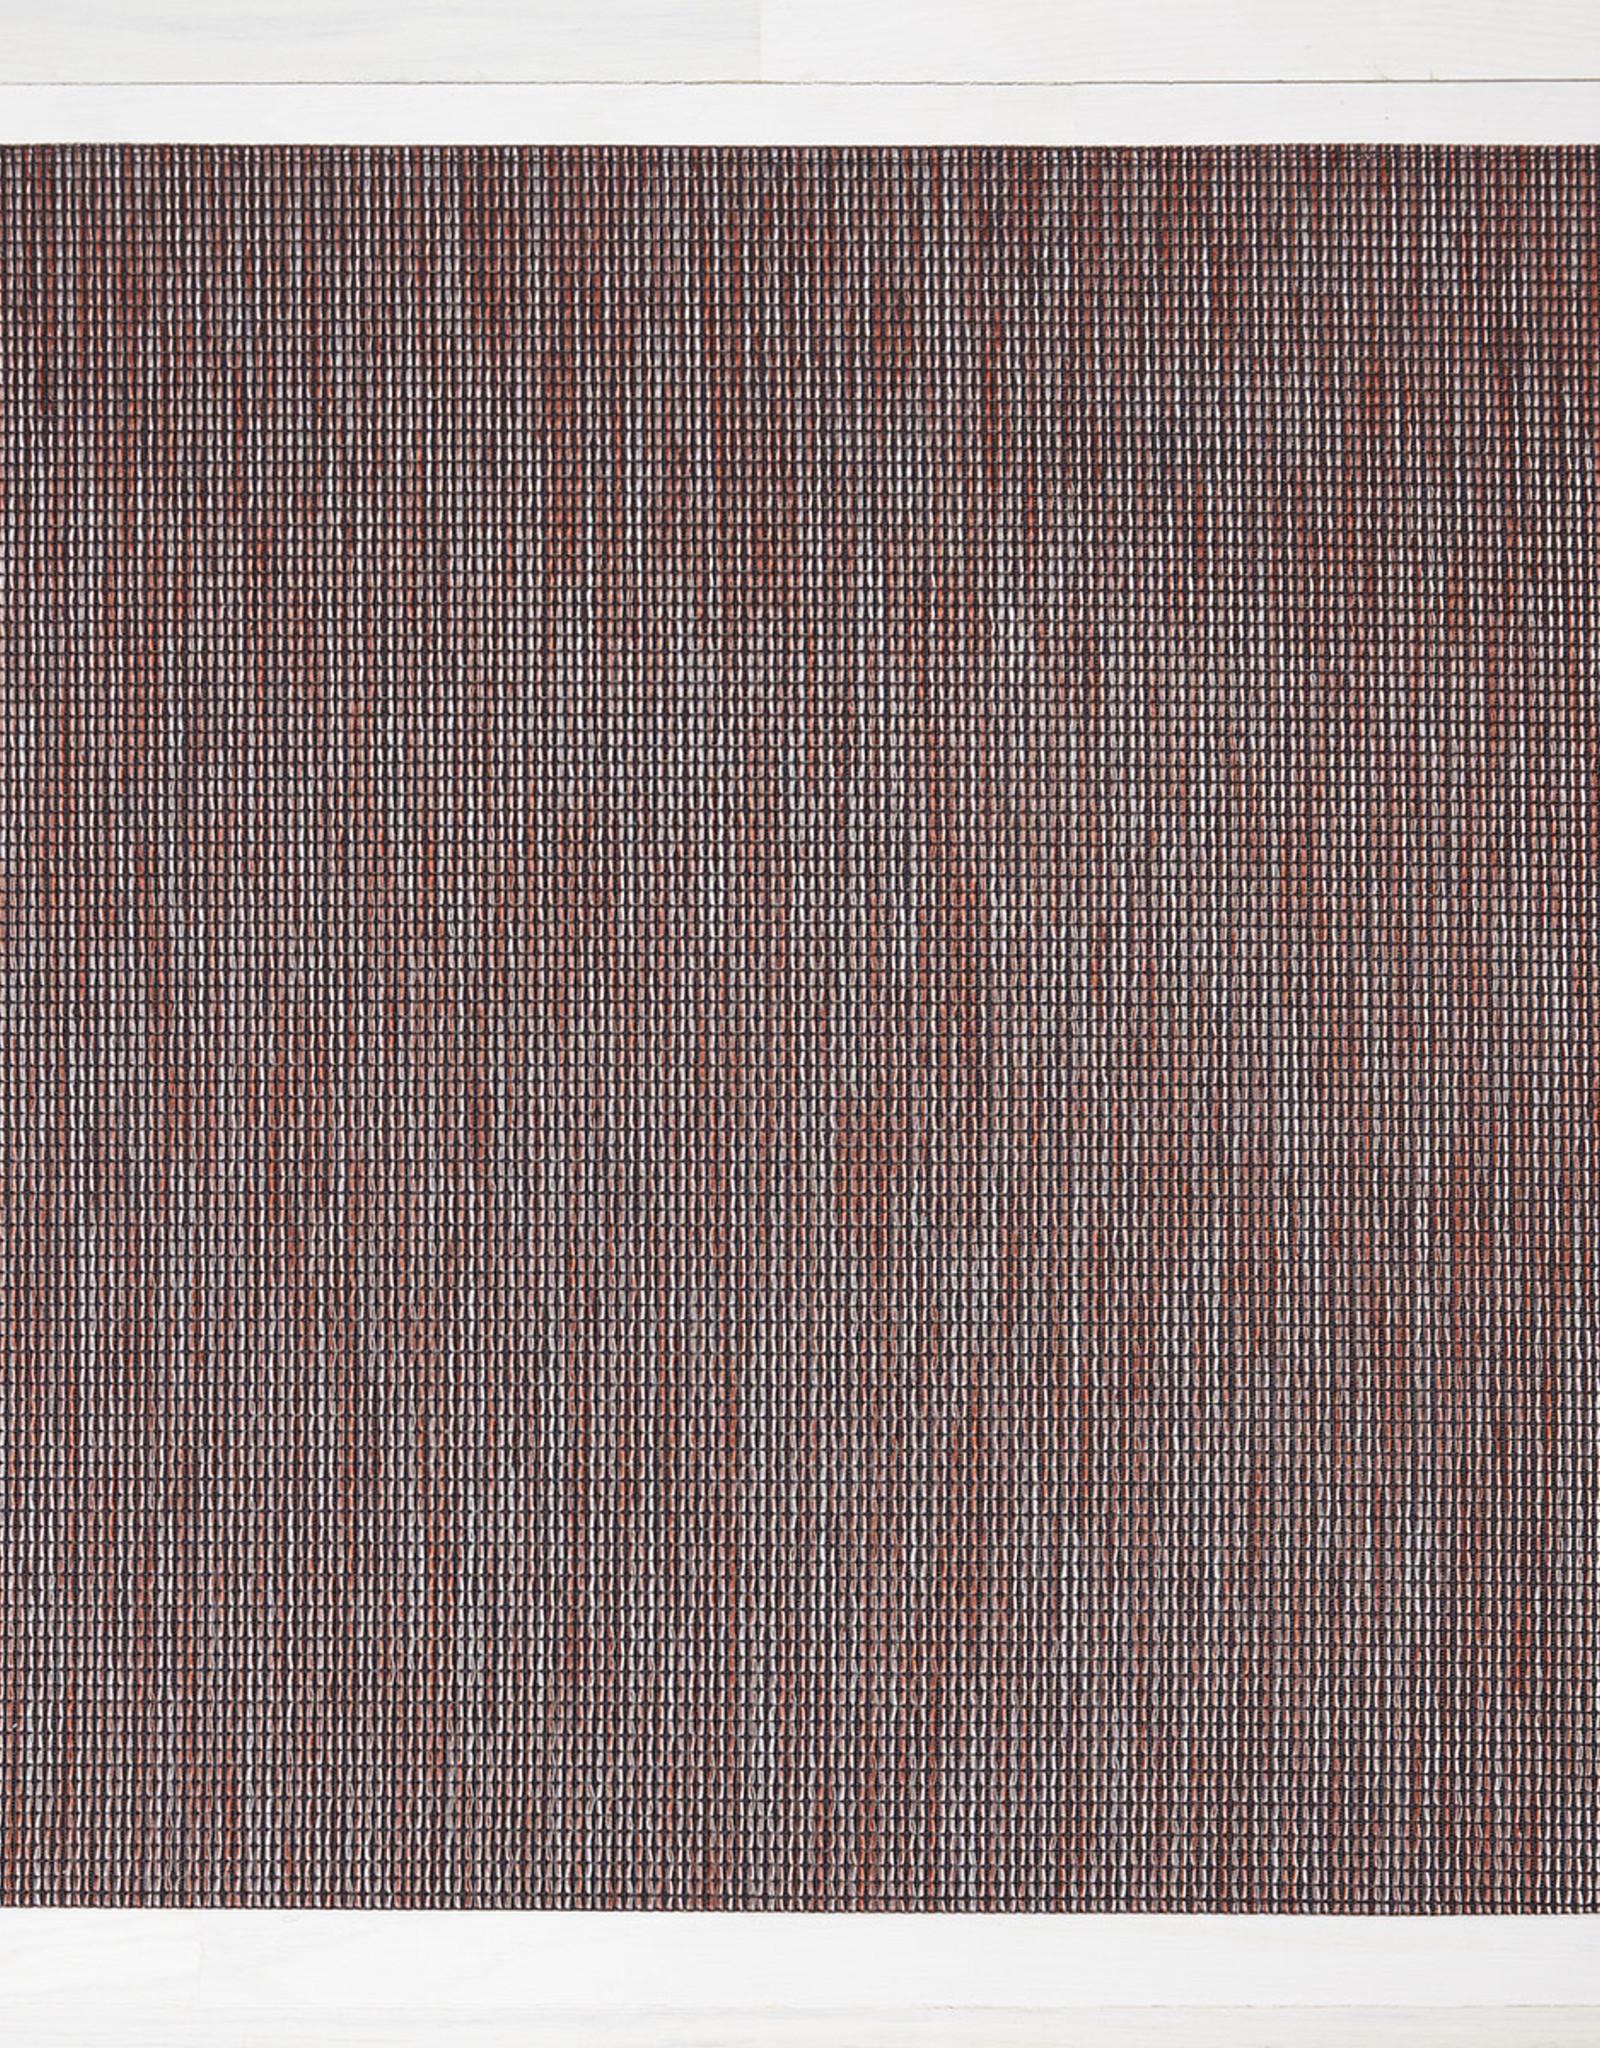 Chilewich Wabi Sabi Floormat 72 x 106, SIENNA